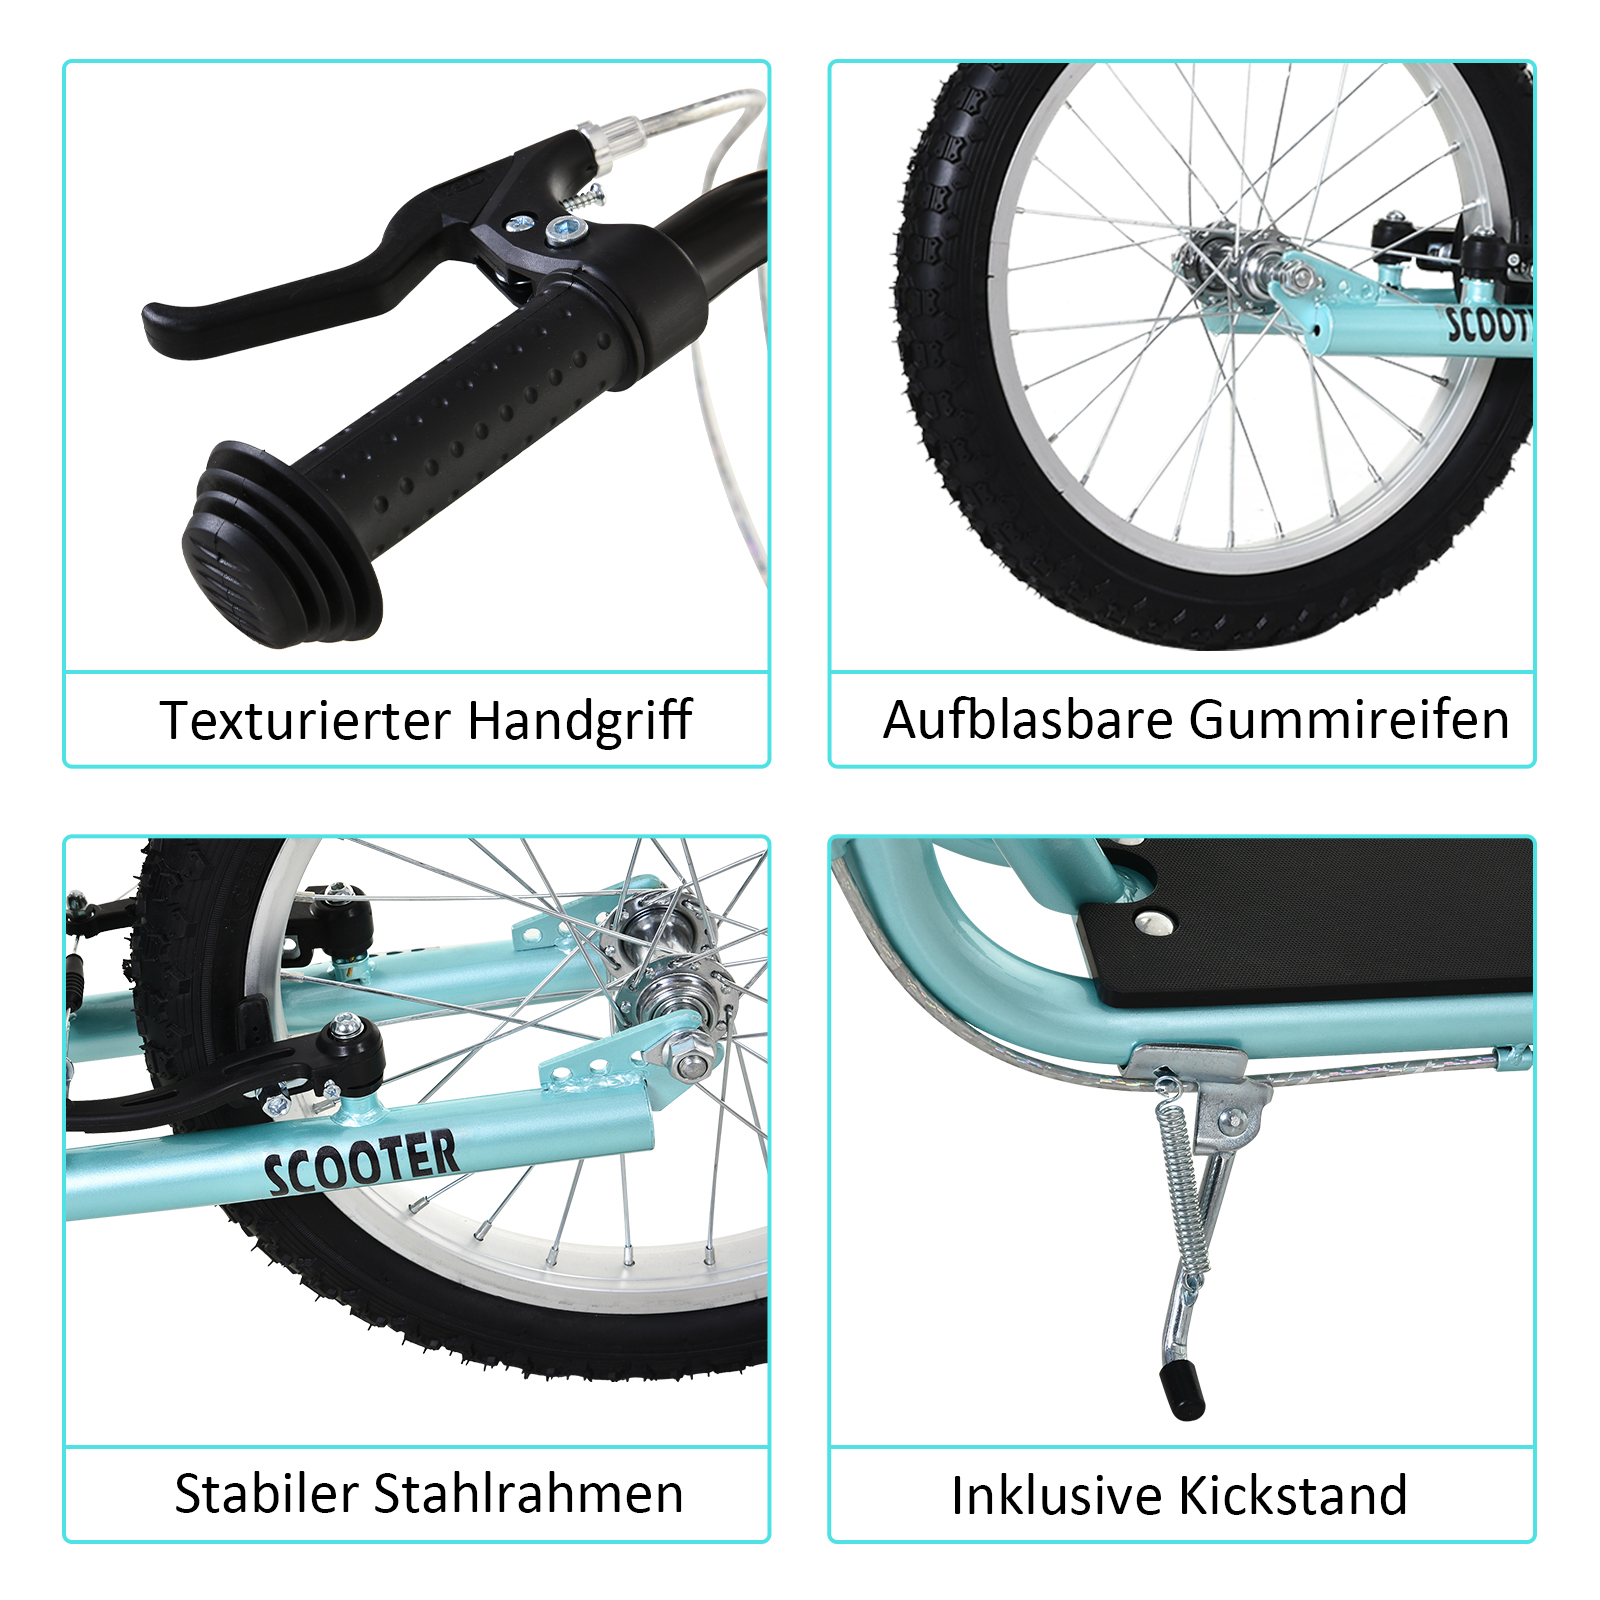 Indexbild 10 - HOMCOM-Tretroller-Kinderroller-Scooter-Cityroller-Roller-verstellbar-Blau-Gruen